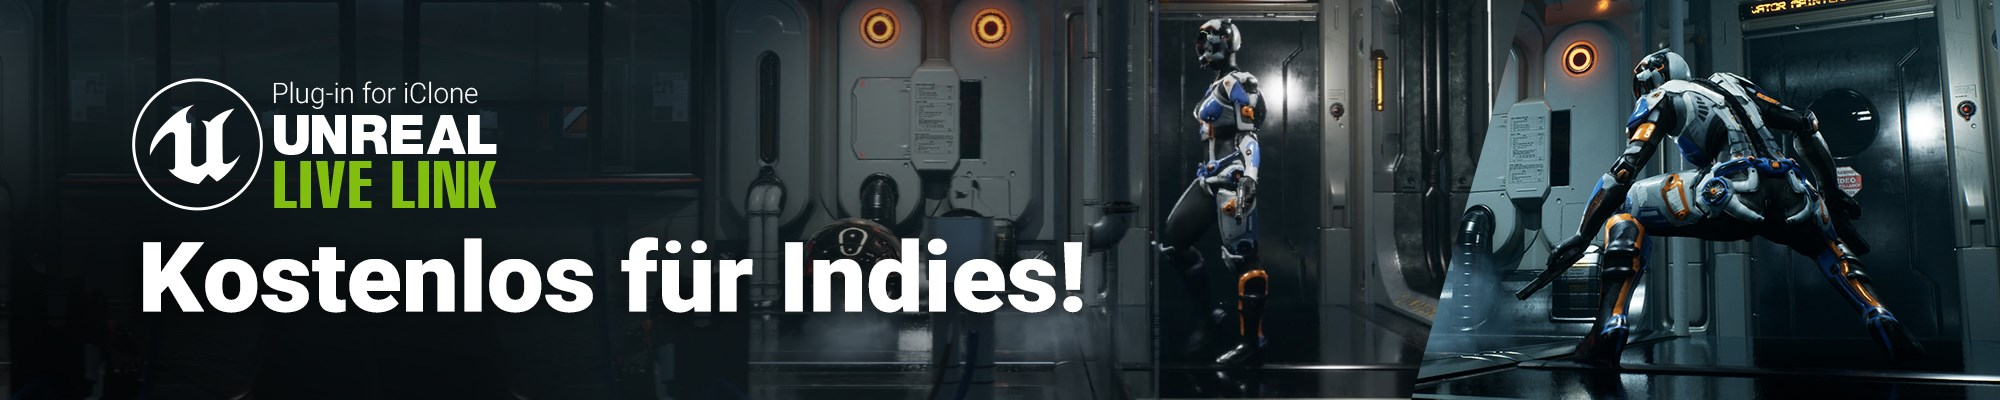 iClone Unreal Live Link - Kostenlos für Indies